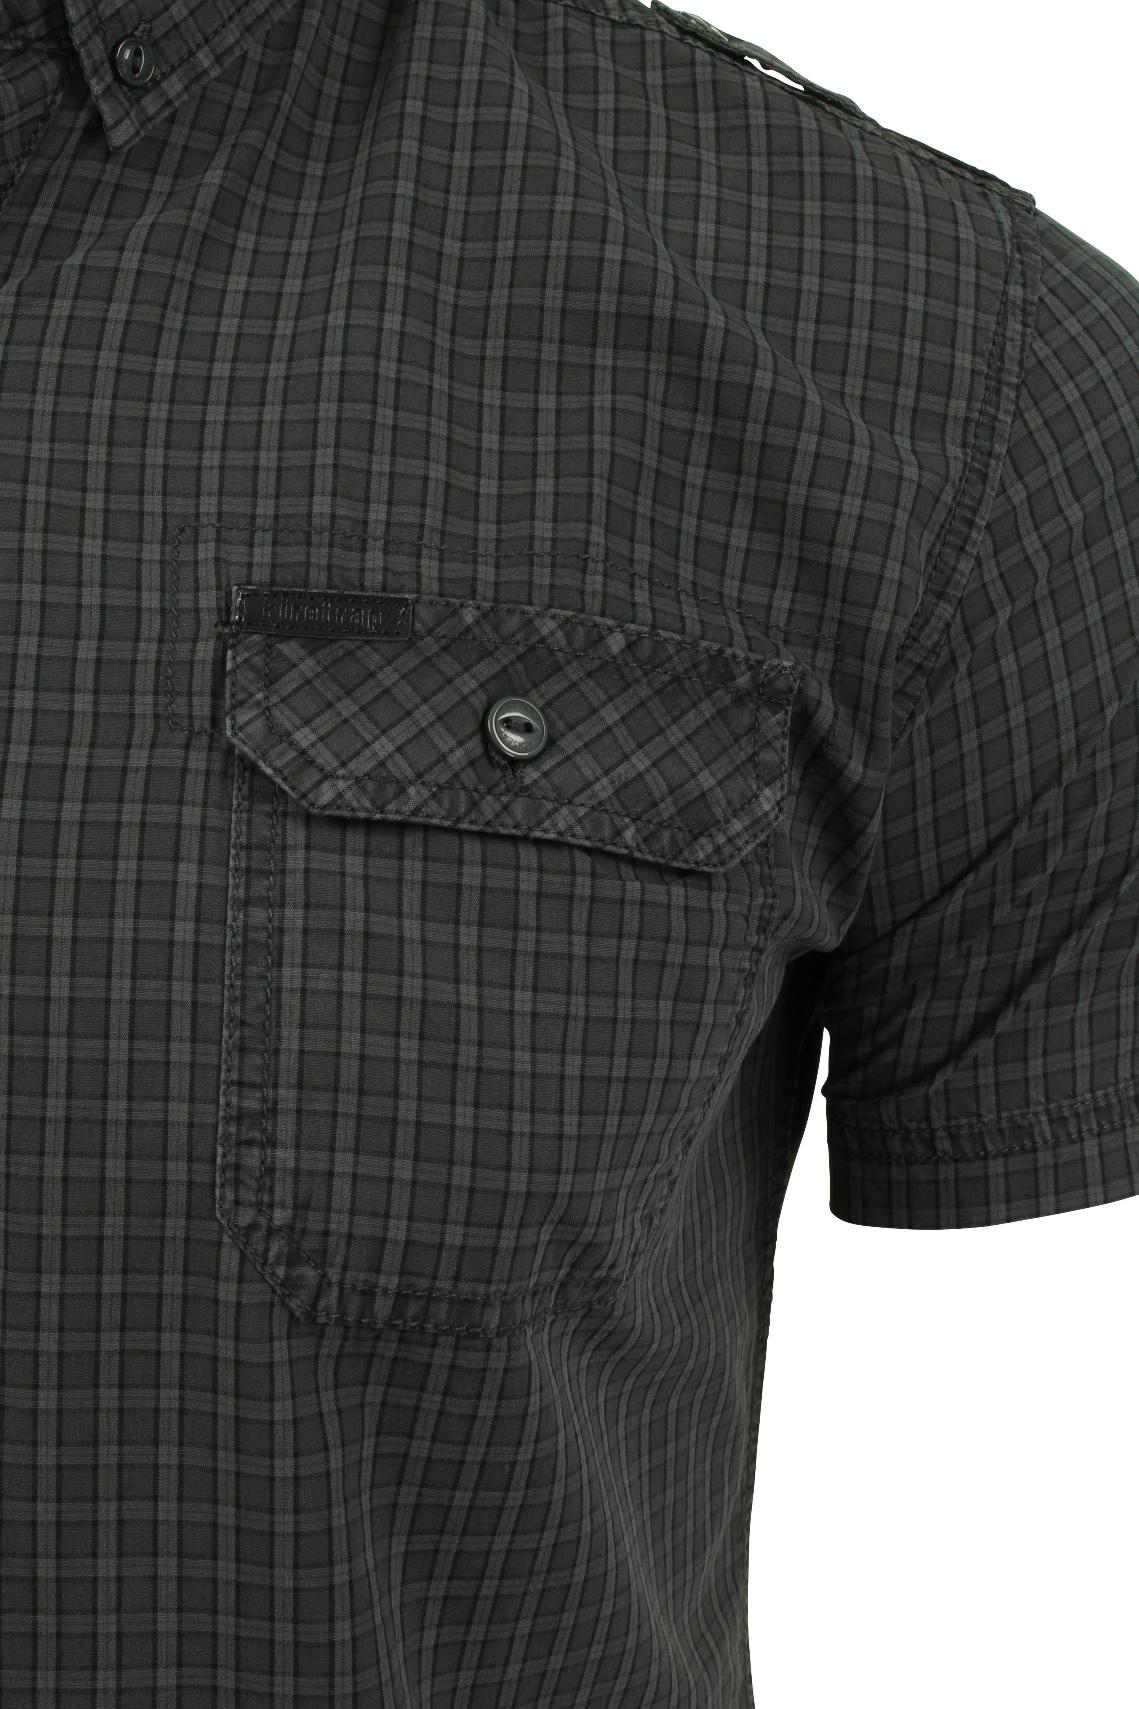 Mens-Short-Sleeved-Shirt-by-Firetrap thumbnail 28